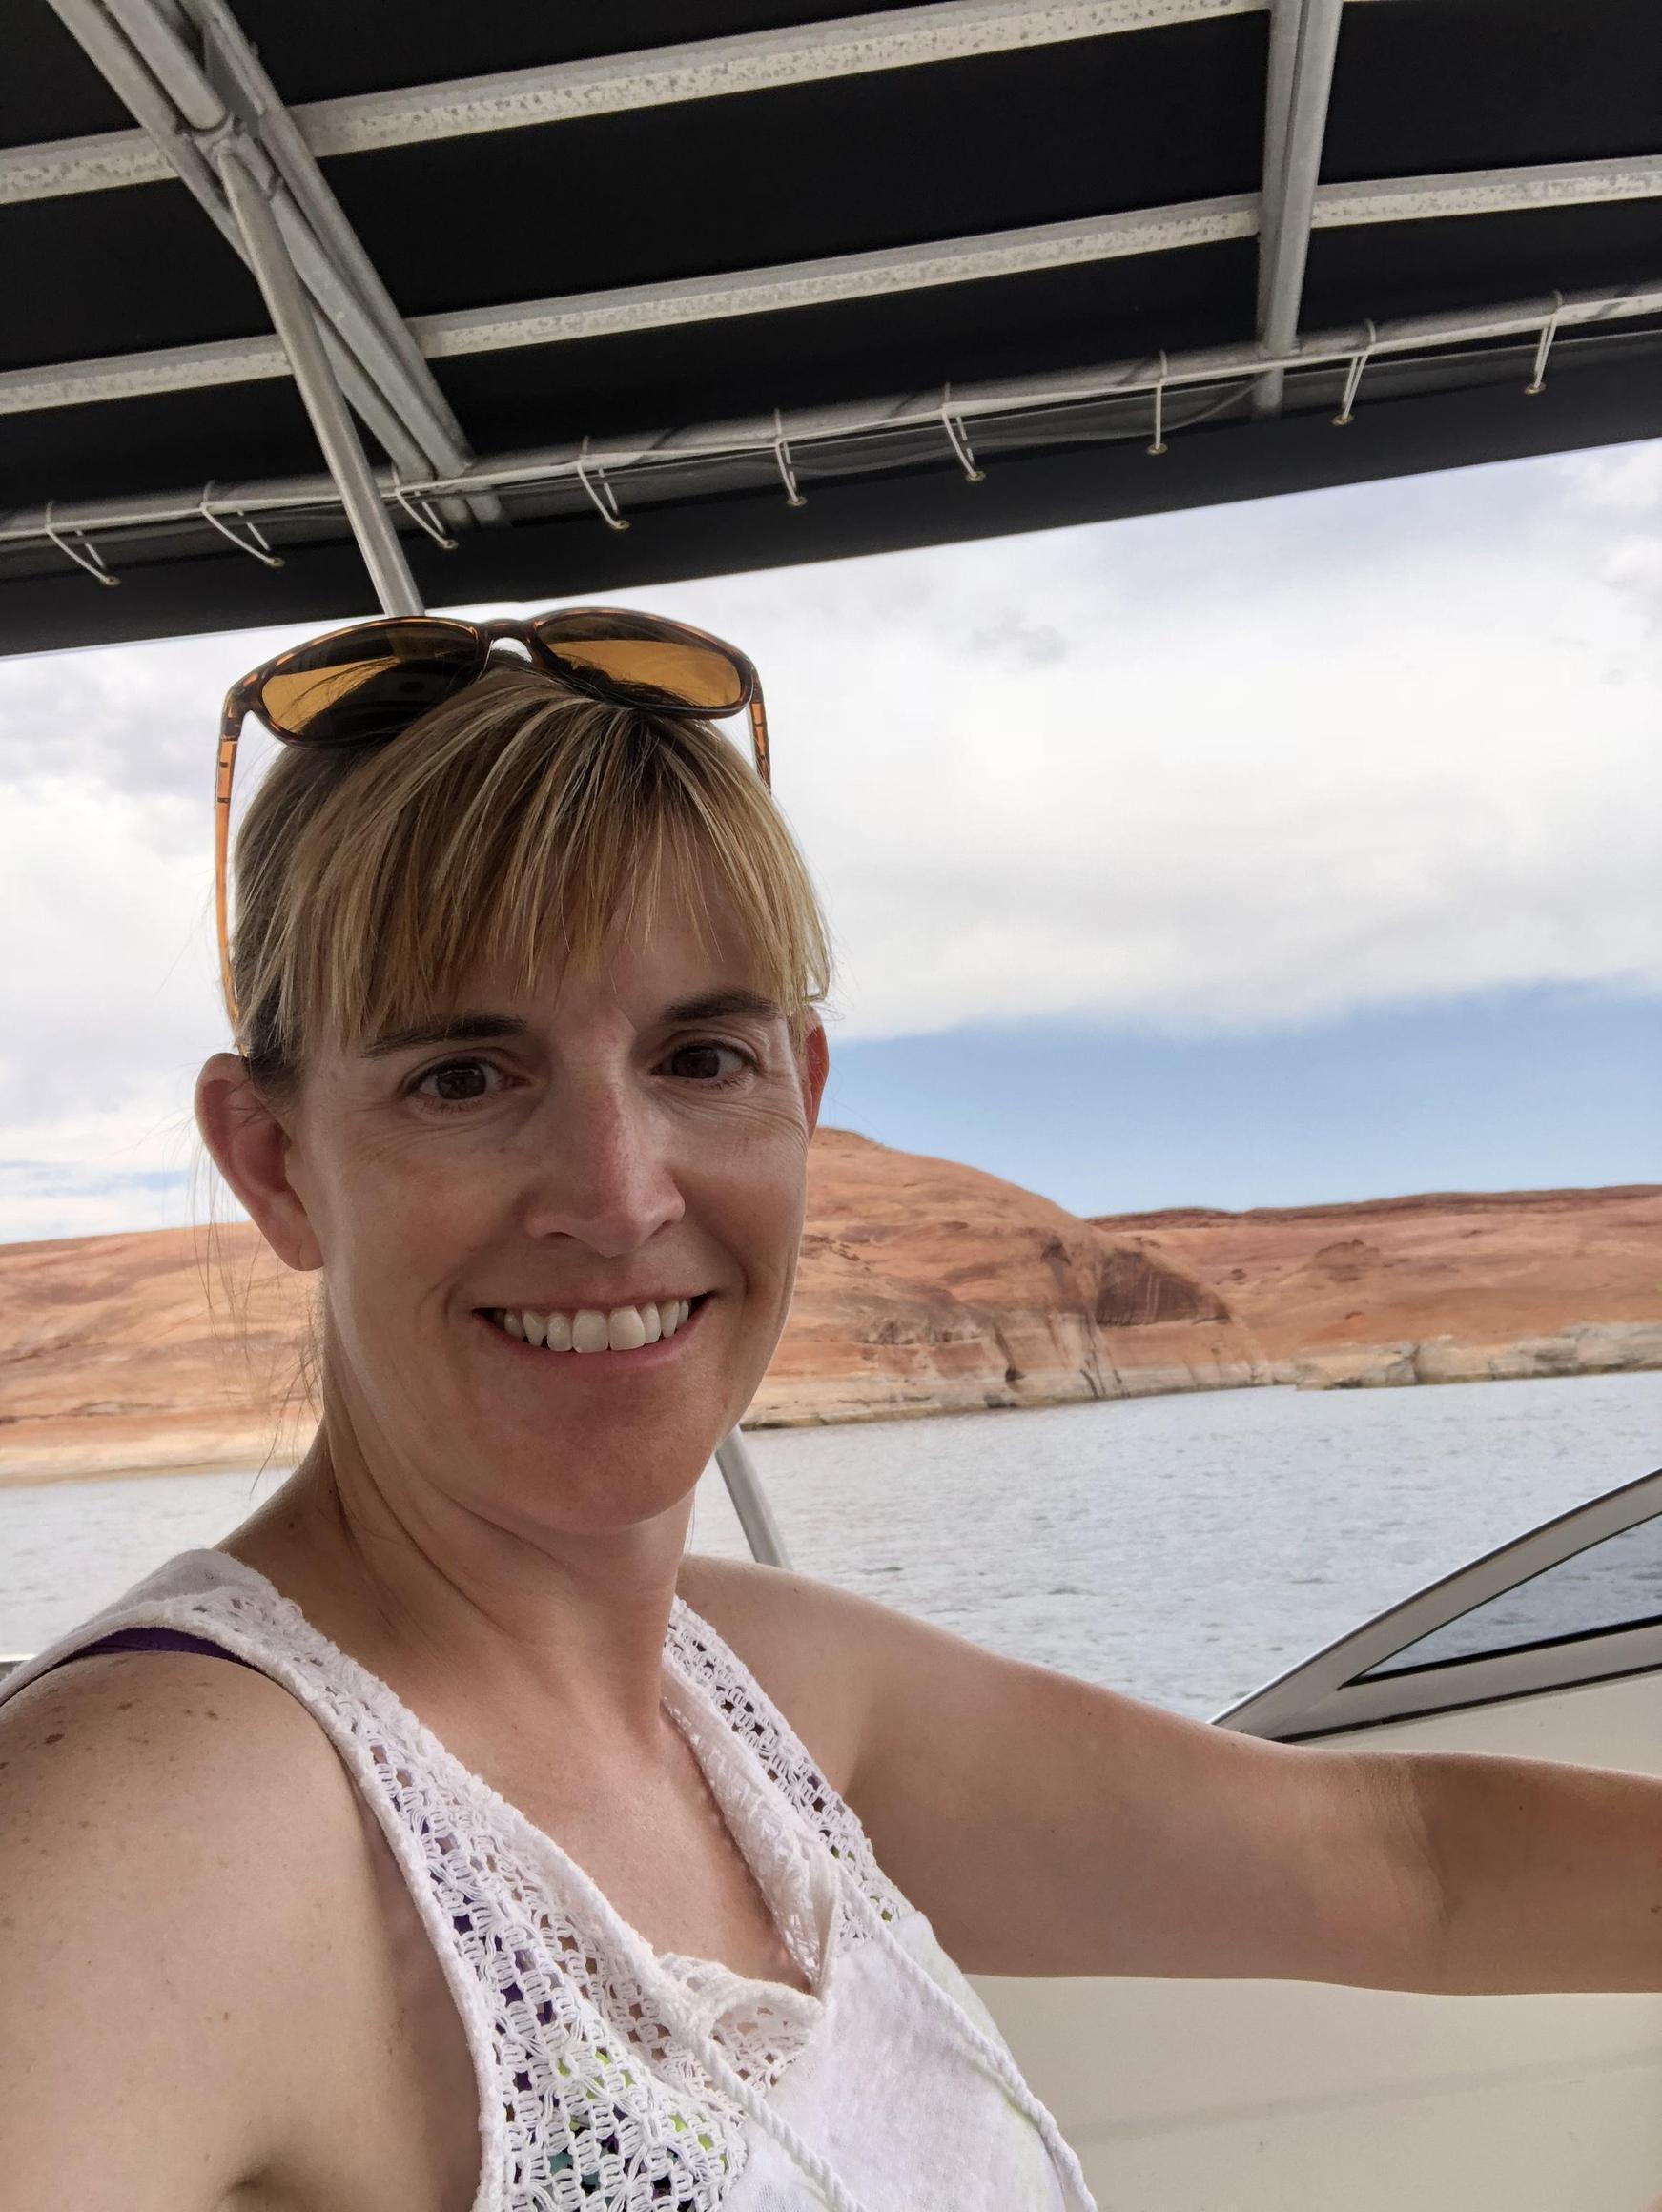 Driving the boat at Lake Powell, 2018